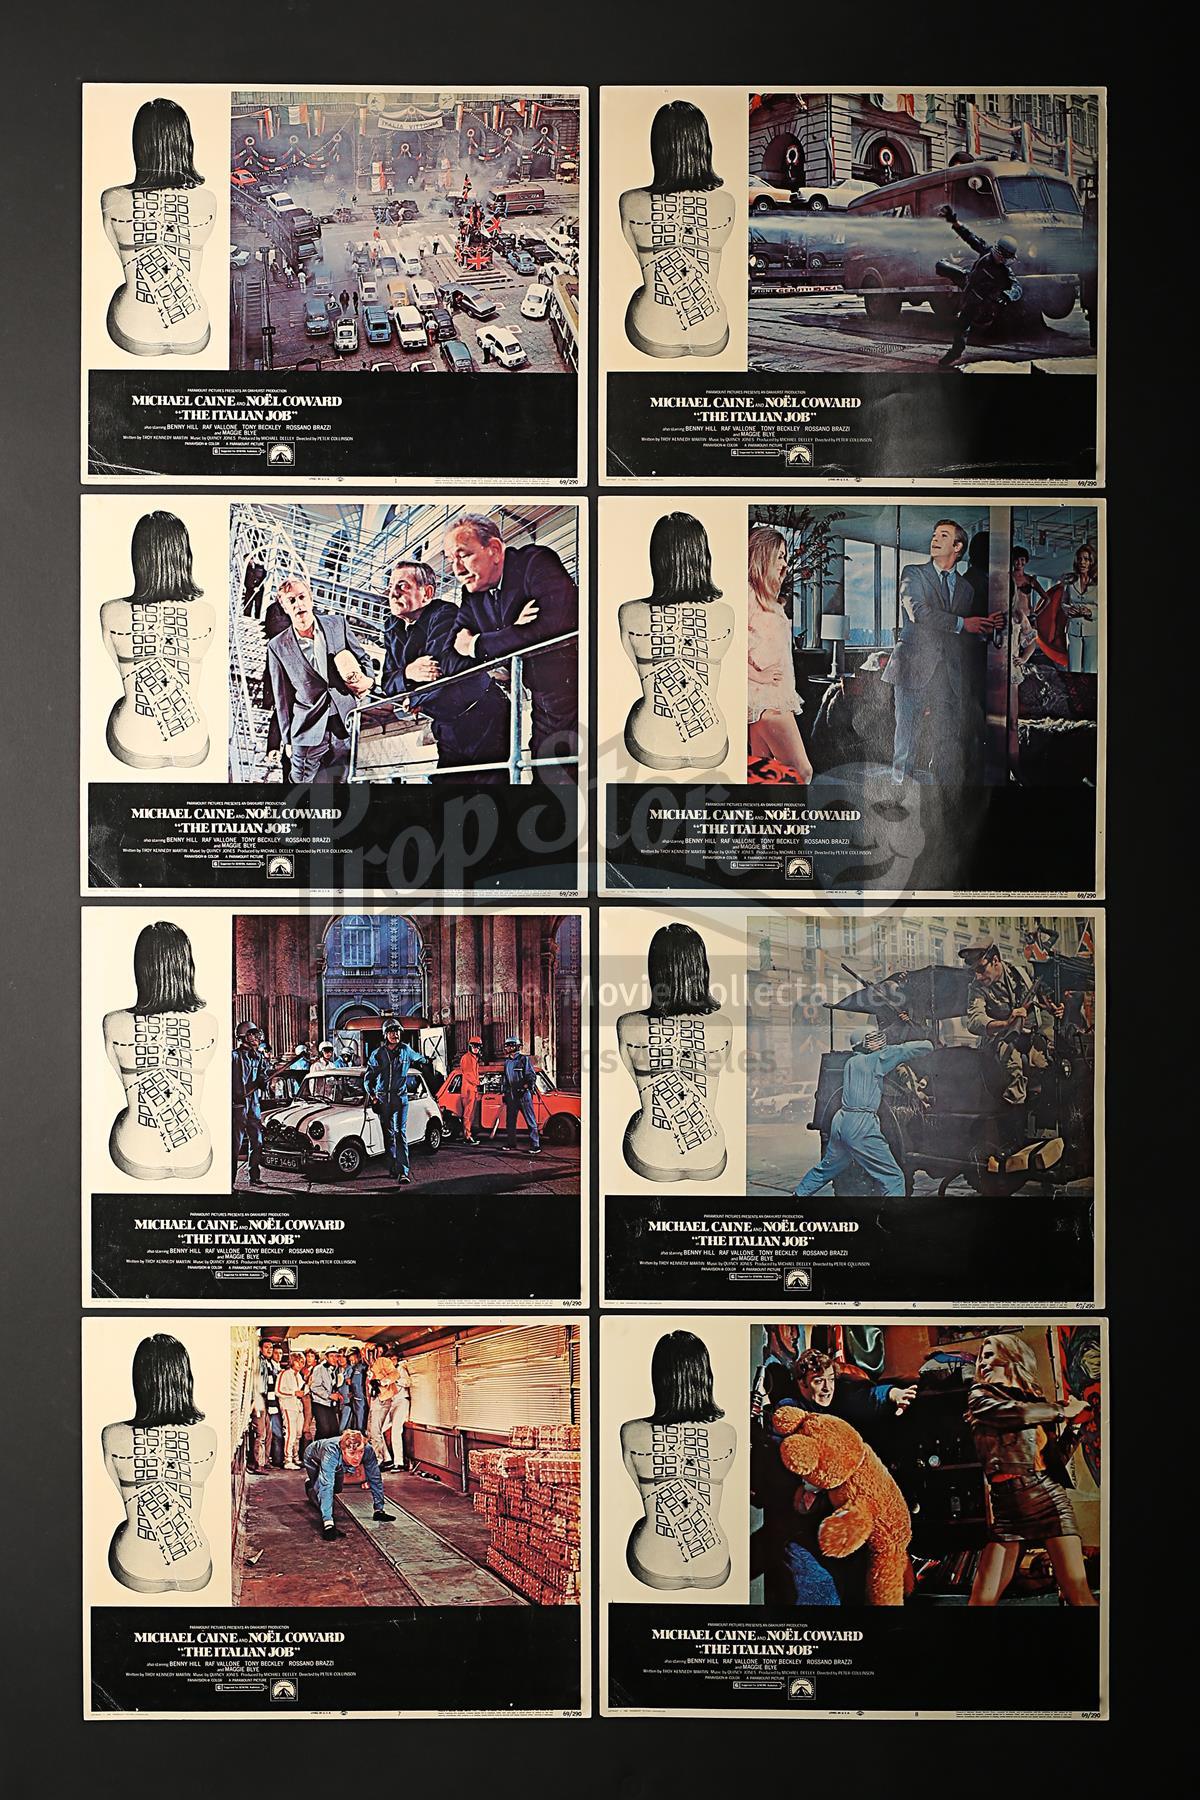 THE ITALIAN JOB (1969) - Set of Eight US Lobby Cards (1969